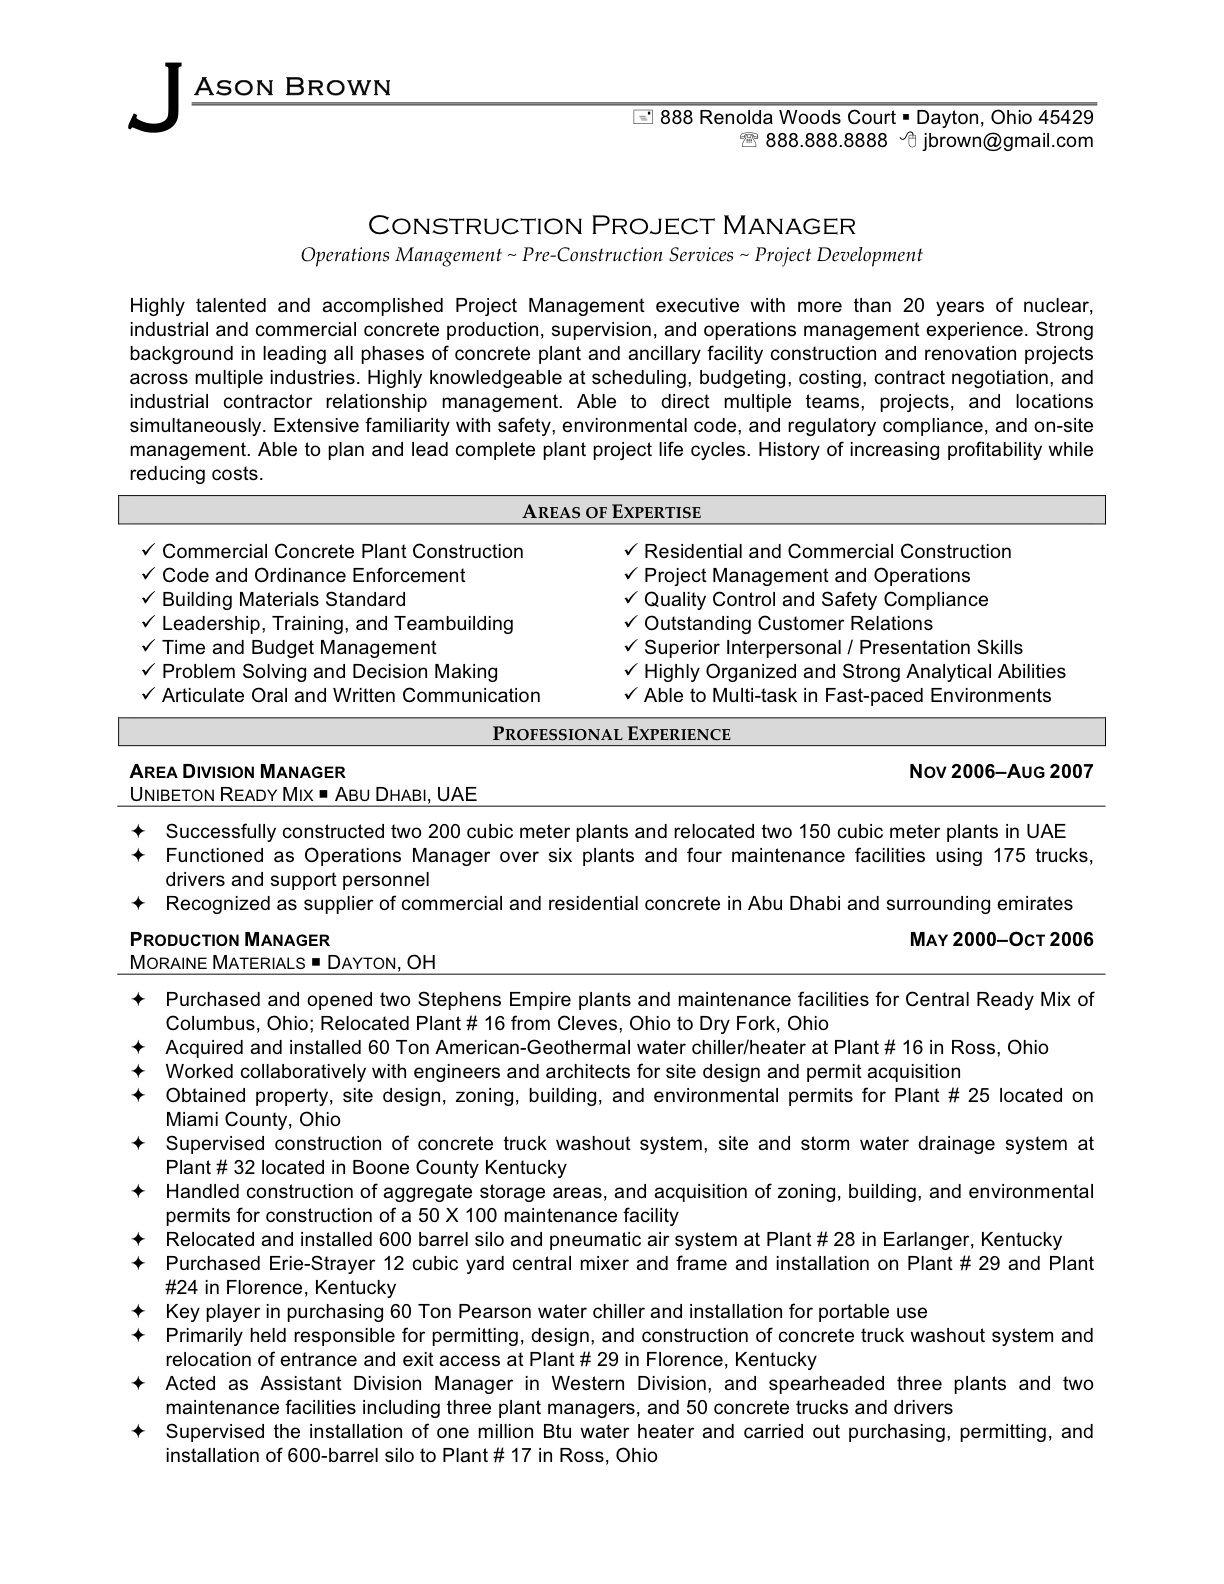 Professional Resume Samples Best Resume Templates Project Manager Resume Manager Resume Resume Skills